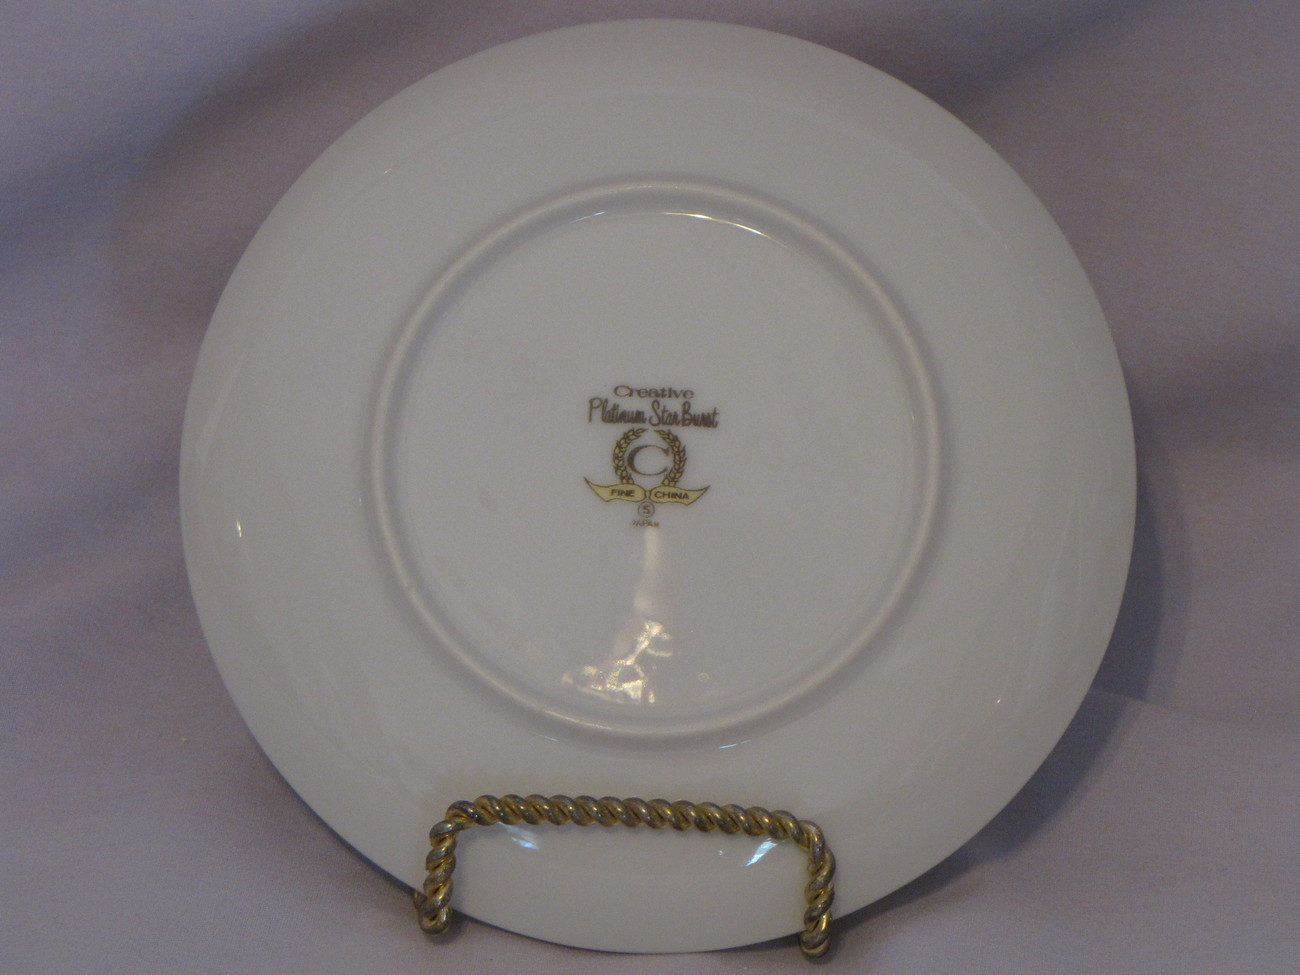 Creative China Platinum Star Burst Bread Plate